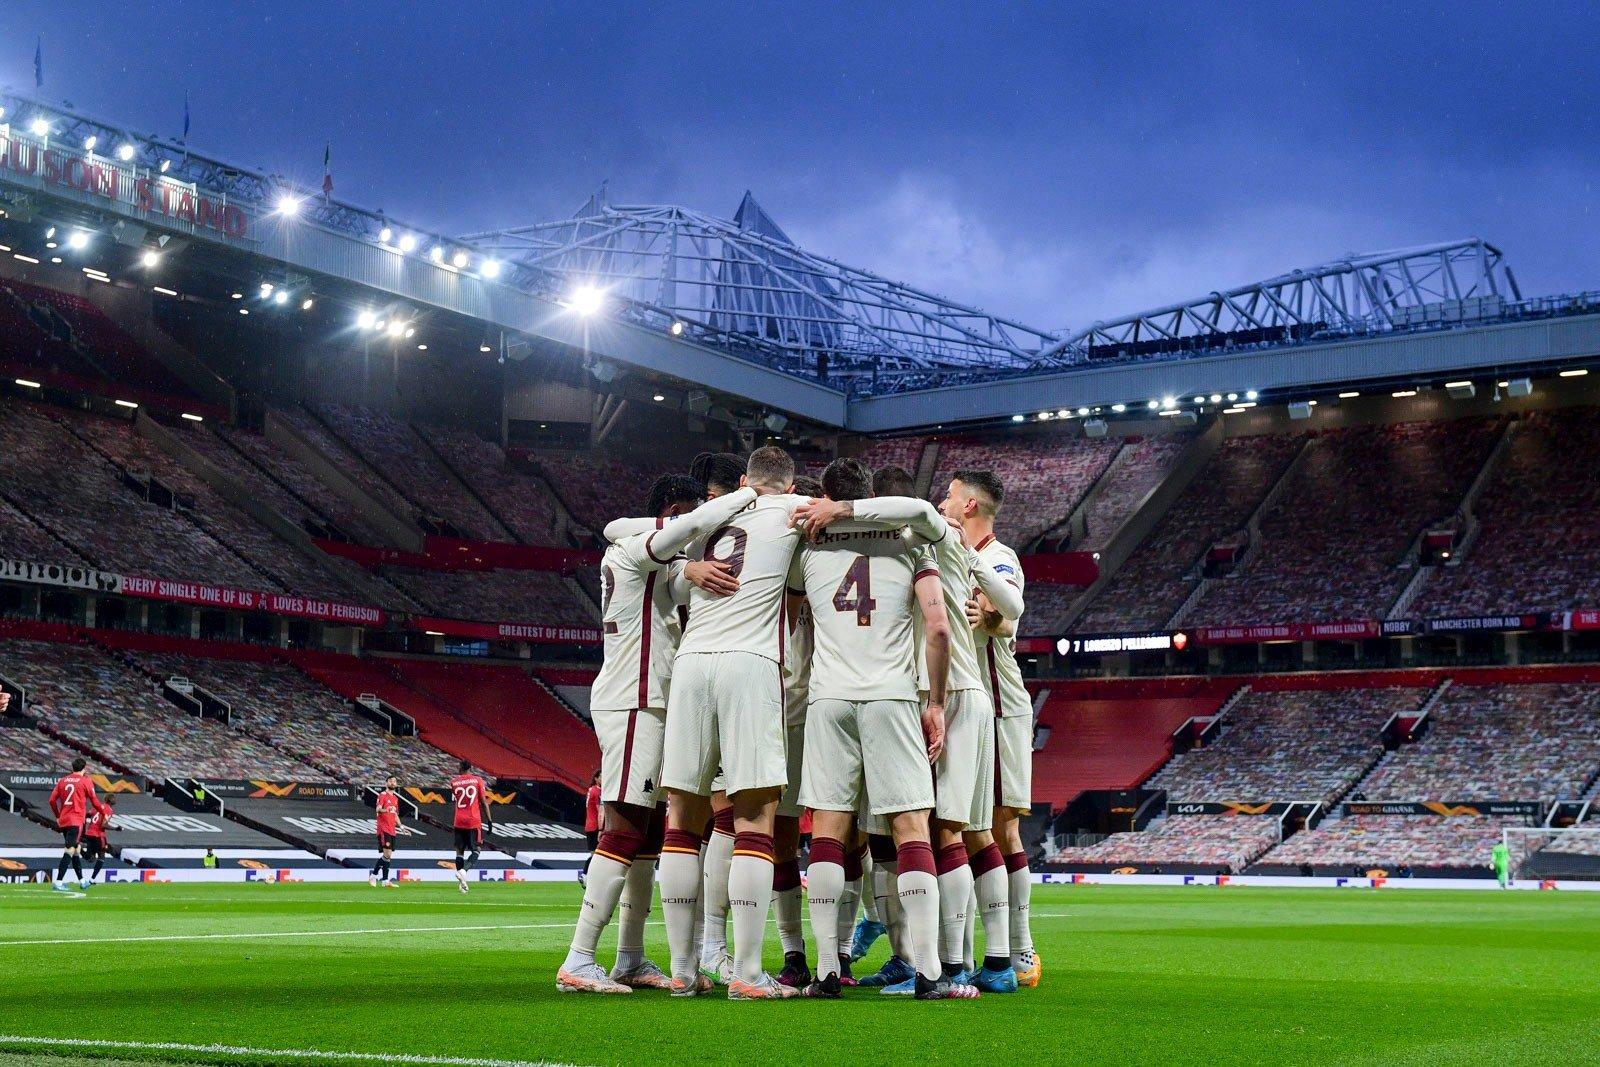 «Рома» – «Манчестер Юнайтед»: матч престижа для итальянцев